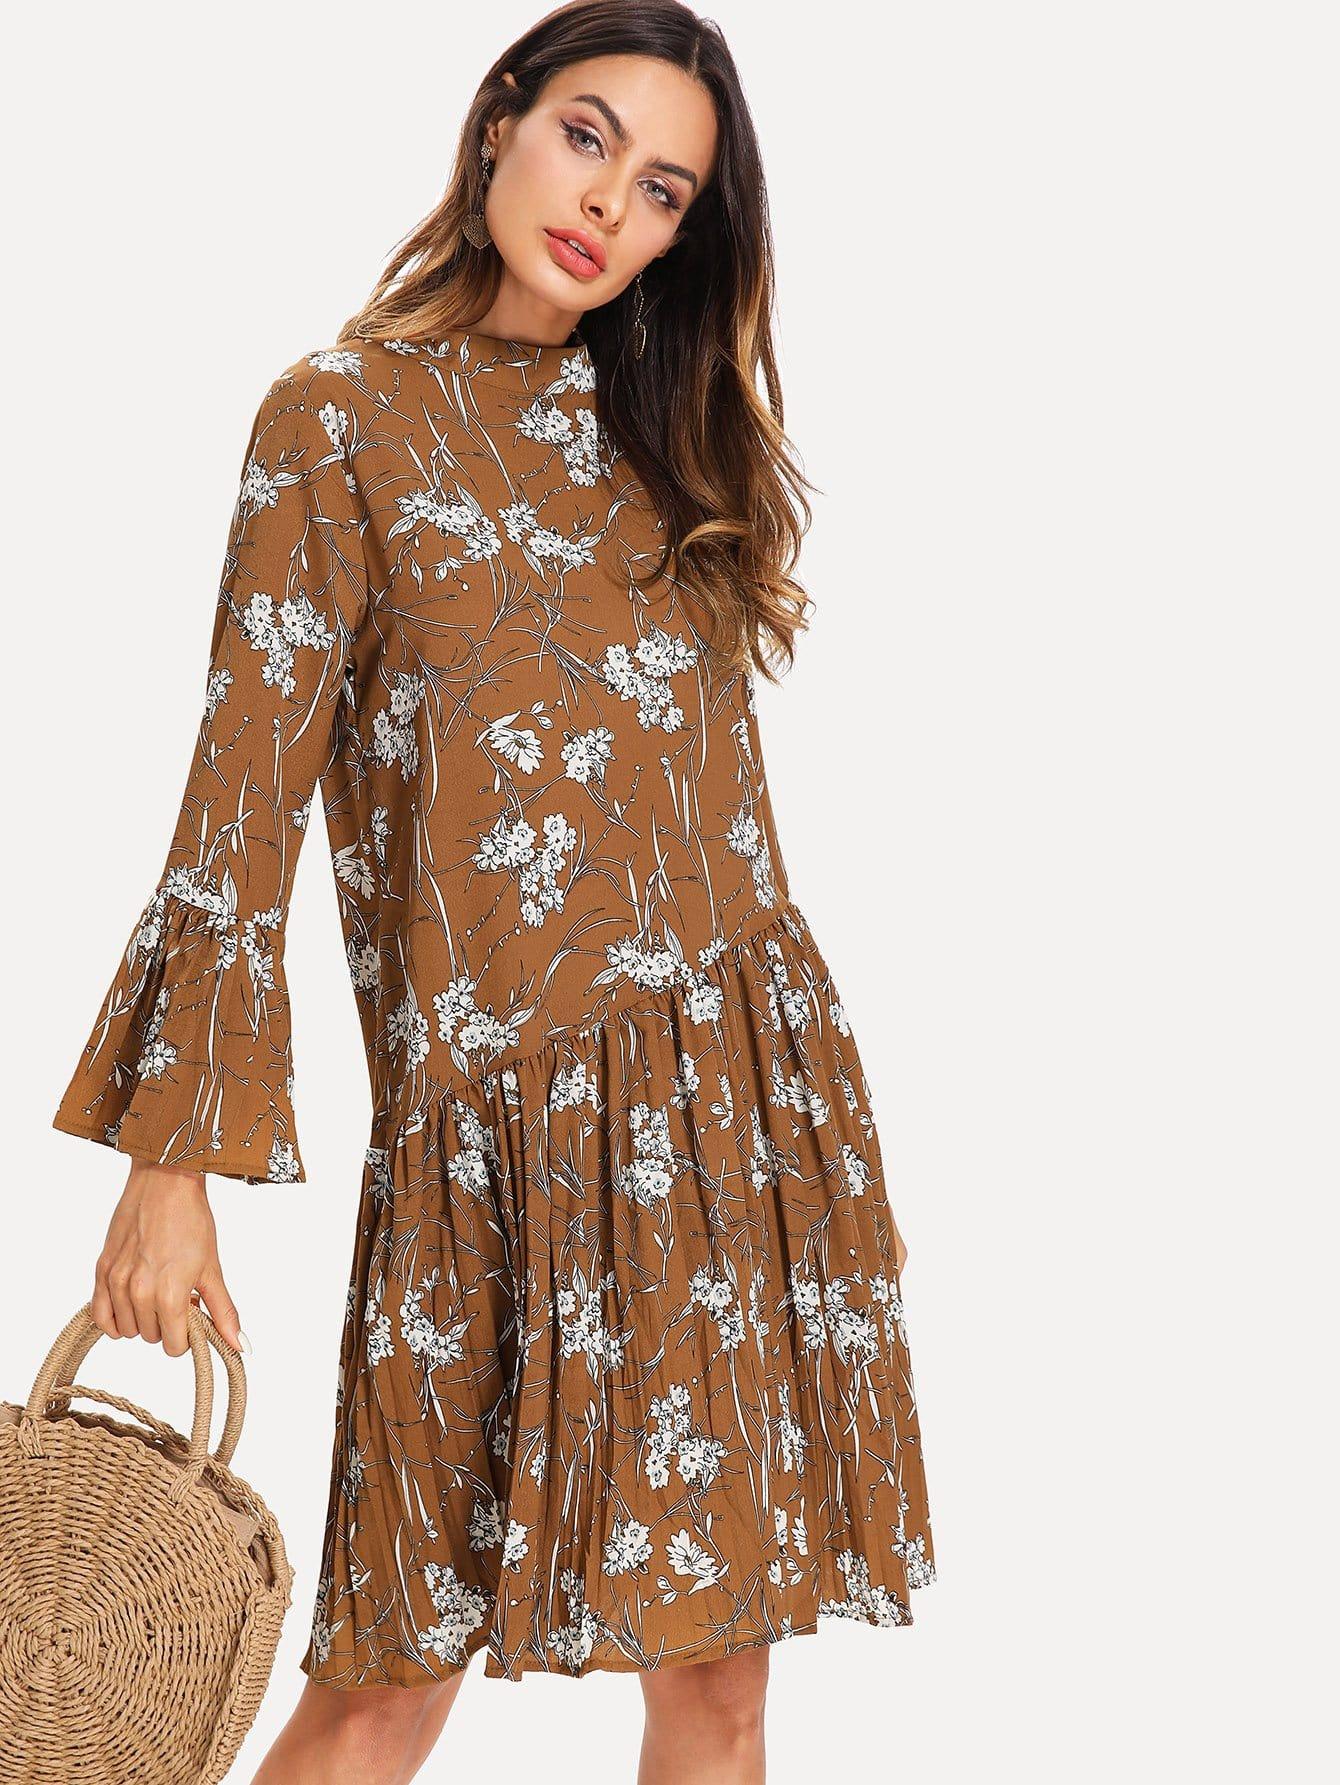 Botanical Print Flounce Sleeve Ruffle Hem Dress contrast binding ruffle hem botanical shorts